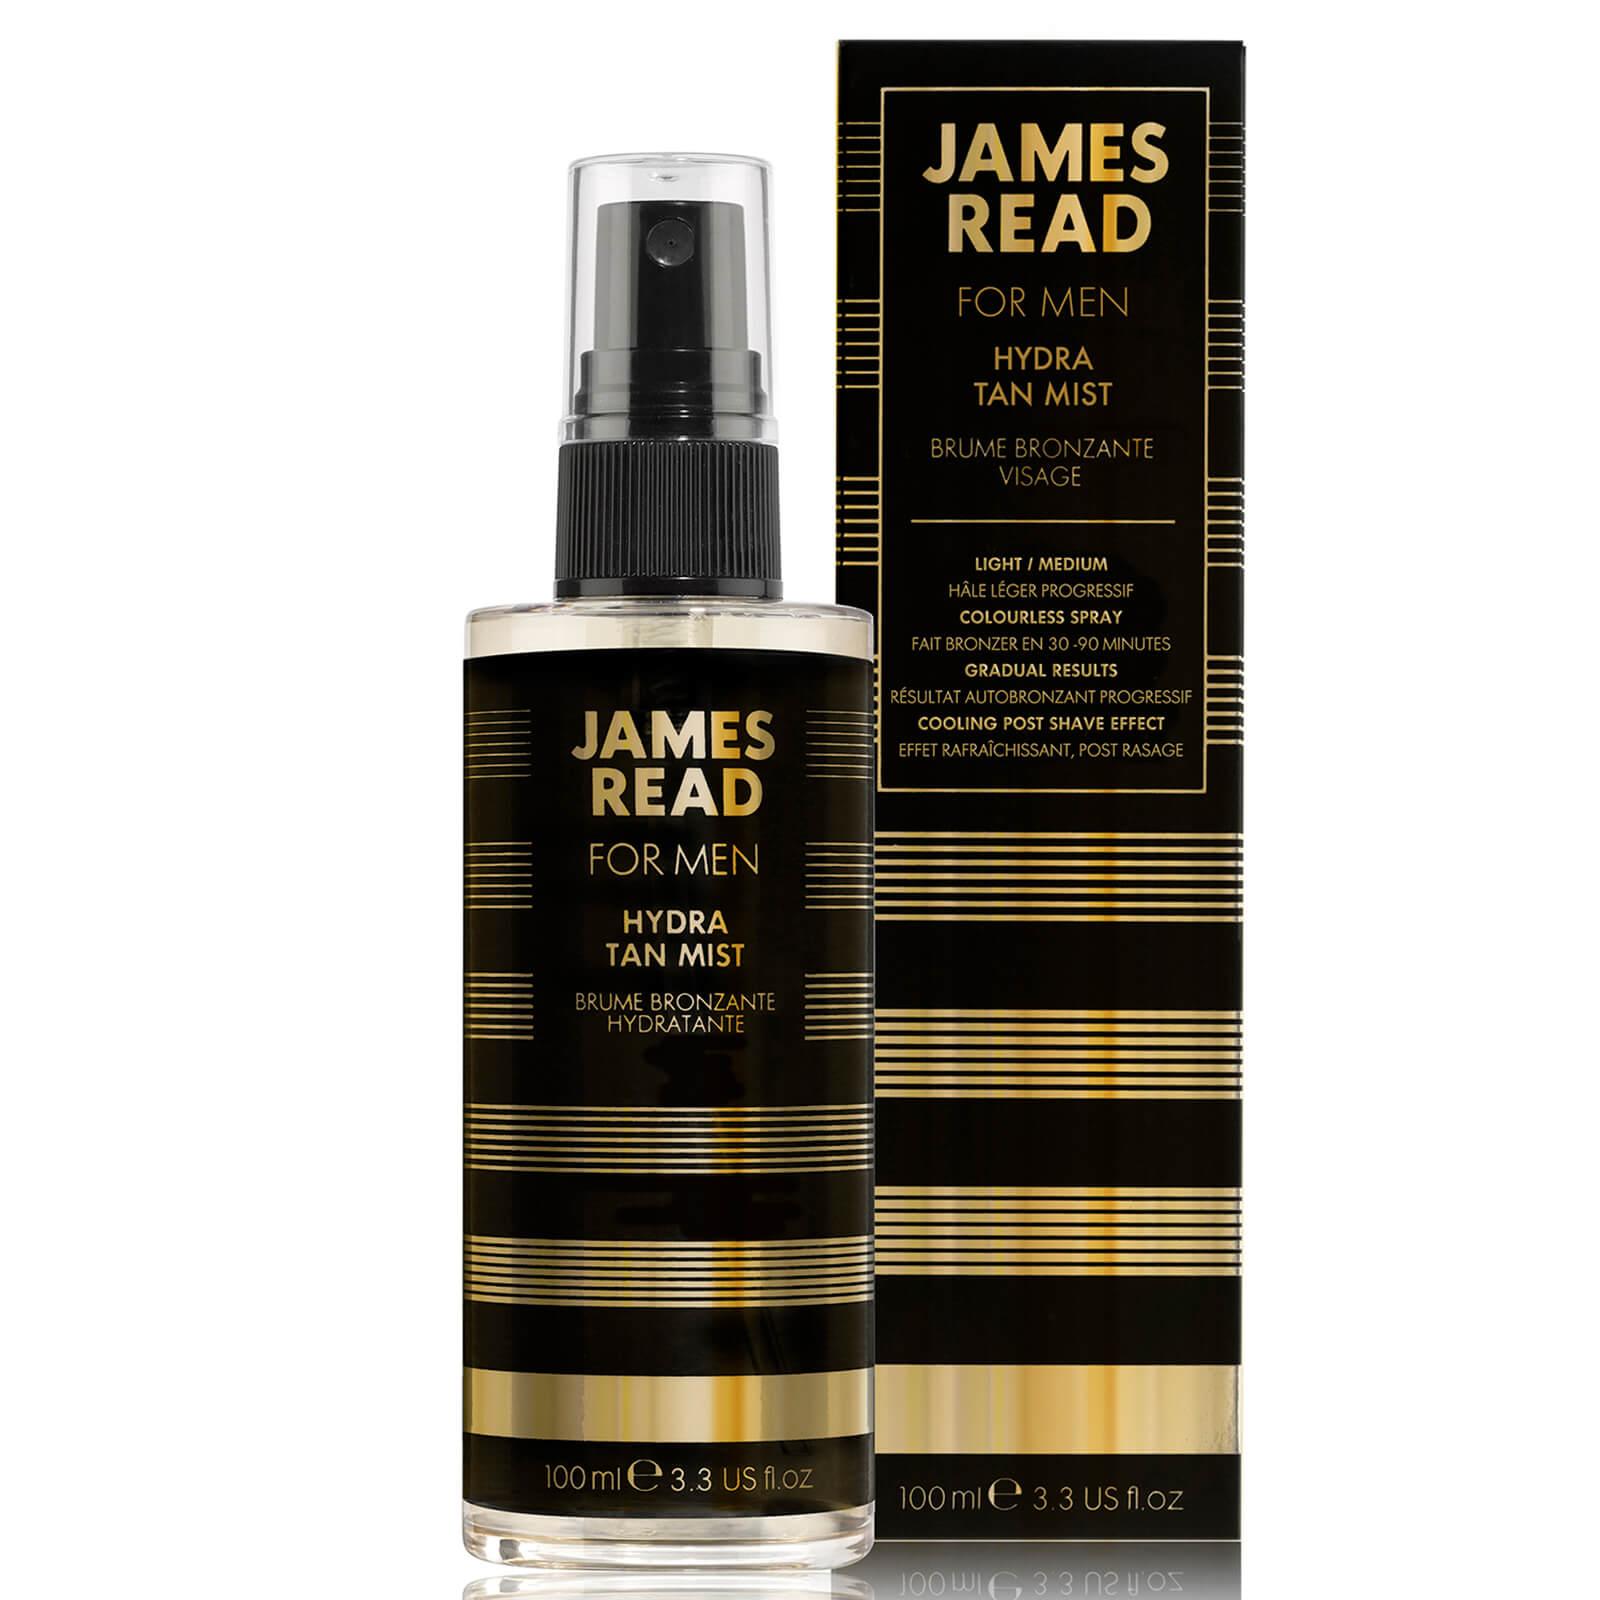 James Read Hydra Tan Mist For Men 100ml Beautyexpert Crabtree Rj45 Module Wiring Diagram Product Description